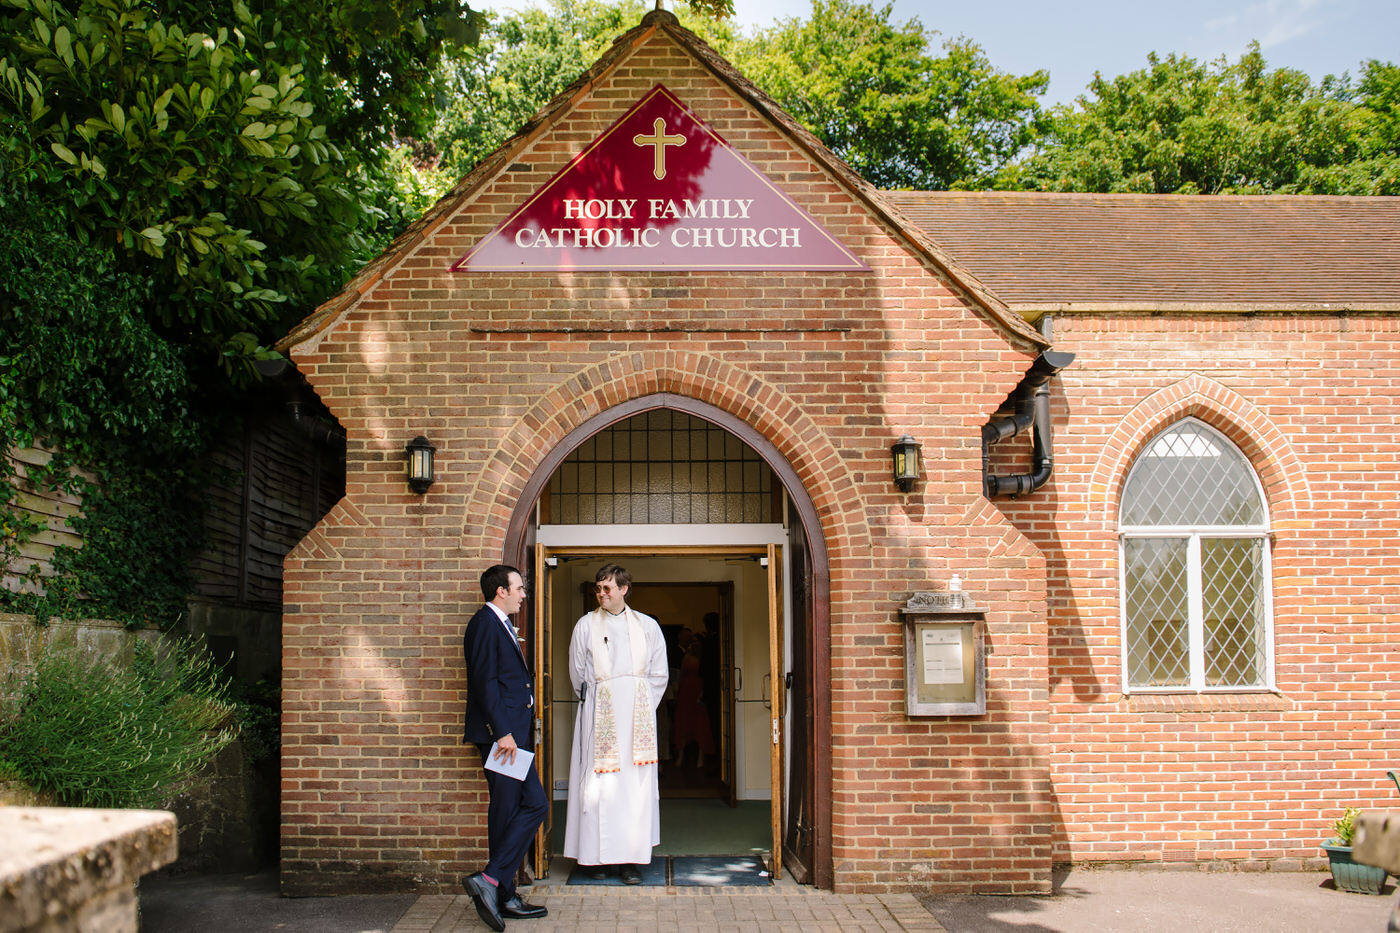 Wedding photographer Farnham